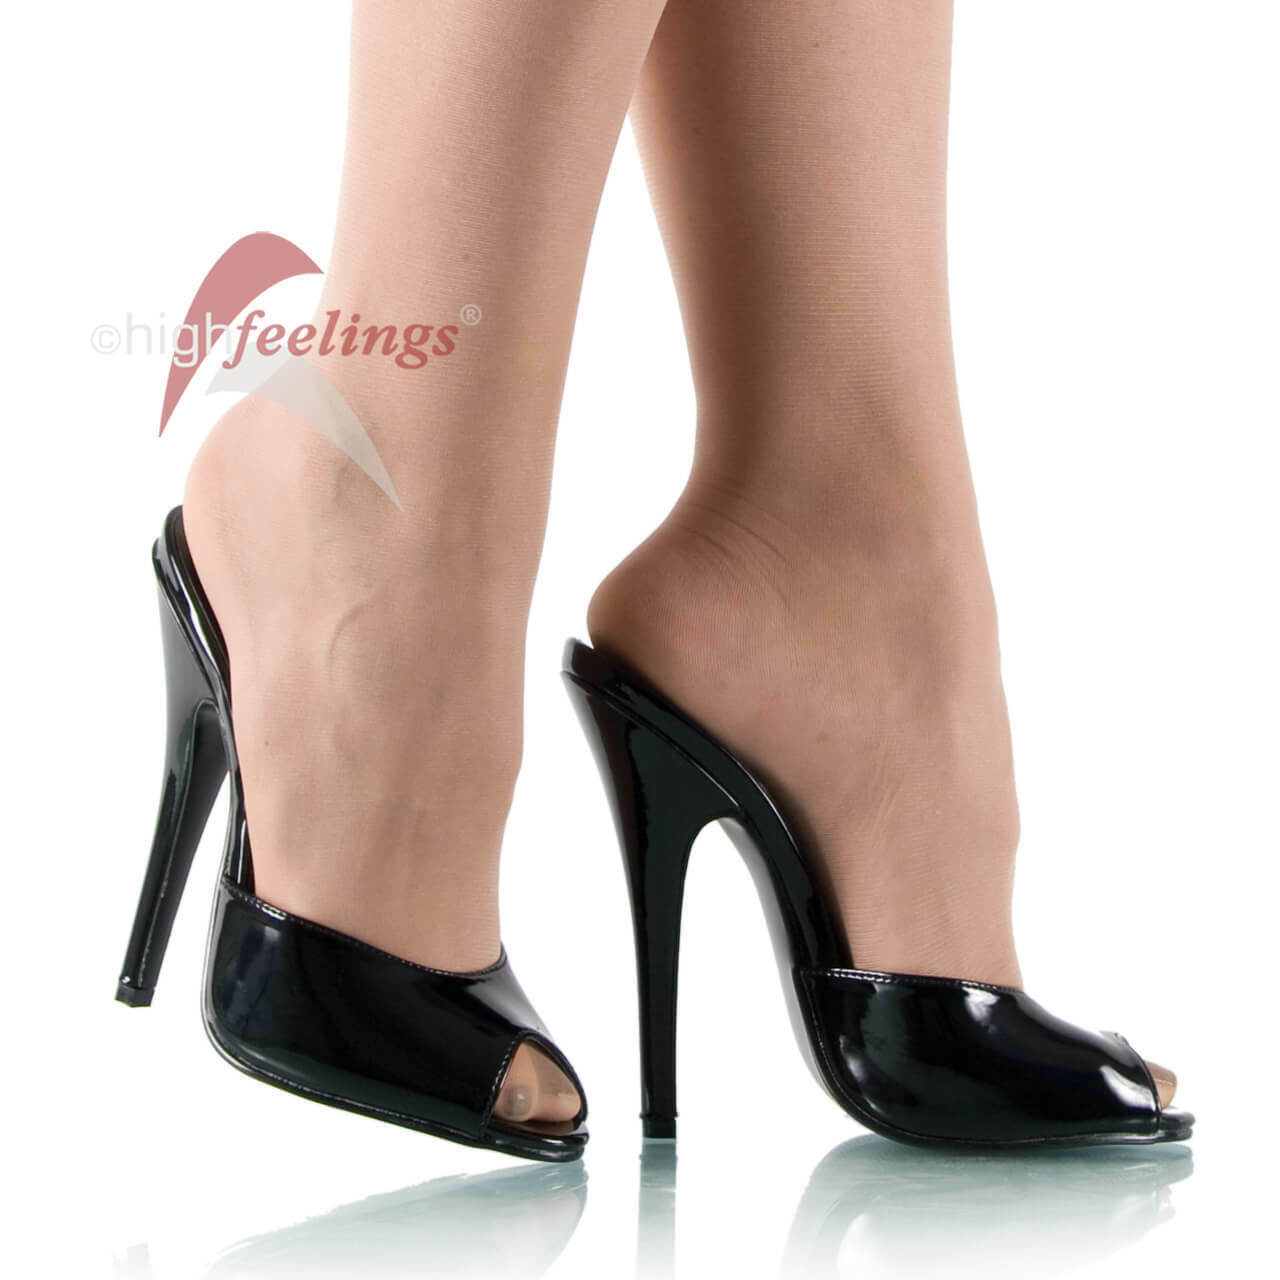 Sexy Pantoletten High Heels DOM101/B Lack Schwarz 13 - 15 cm Absatz Gr. 36 - 47